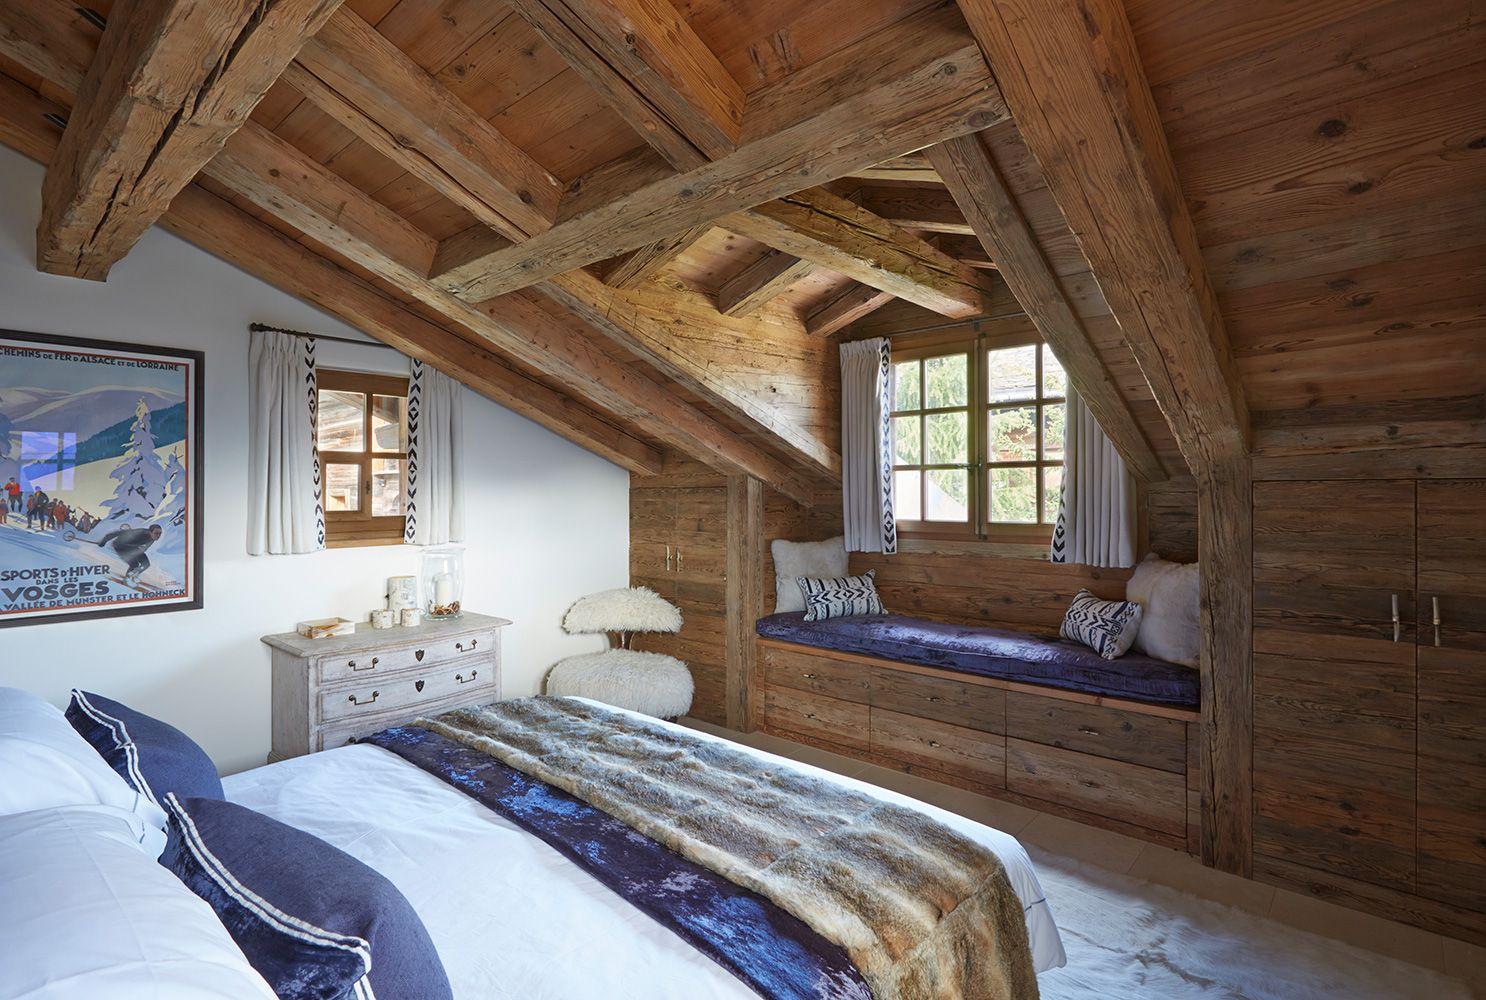 Interior design ∙ chalets ∙ switzerland todhunter earletodhunter